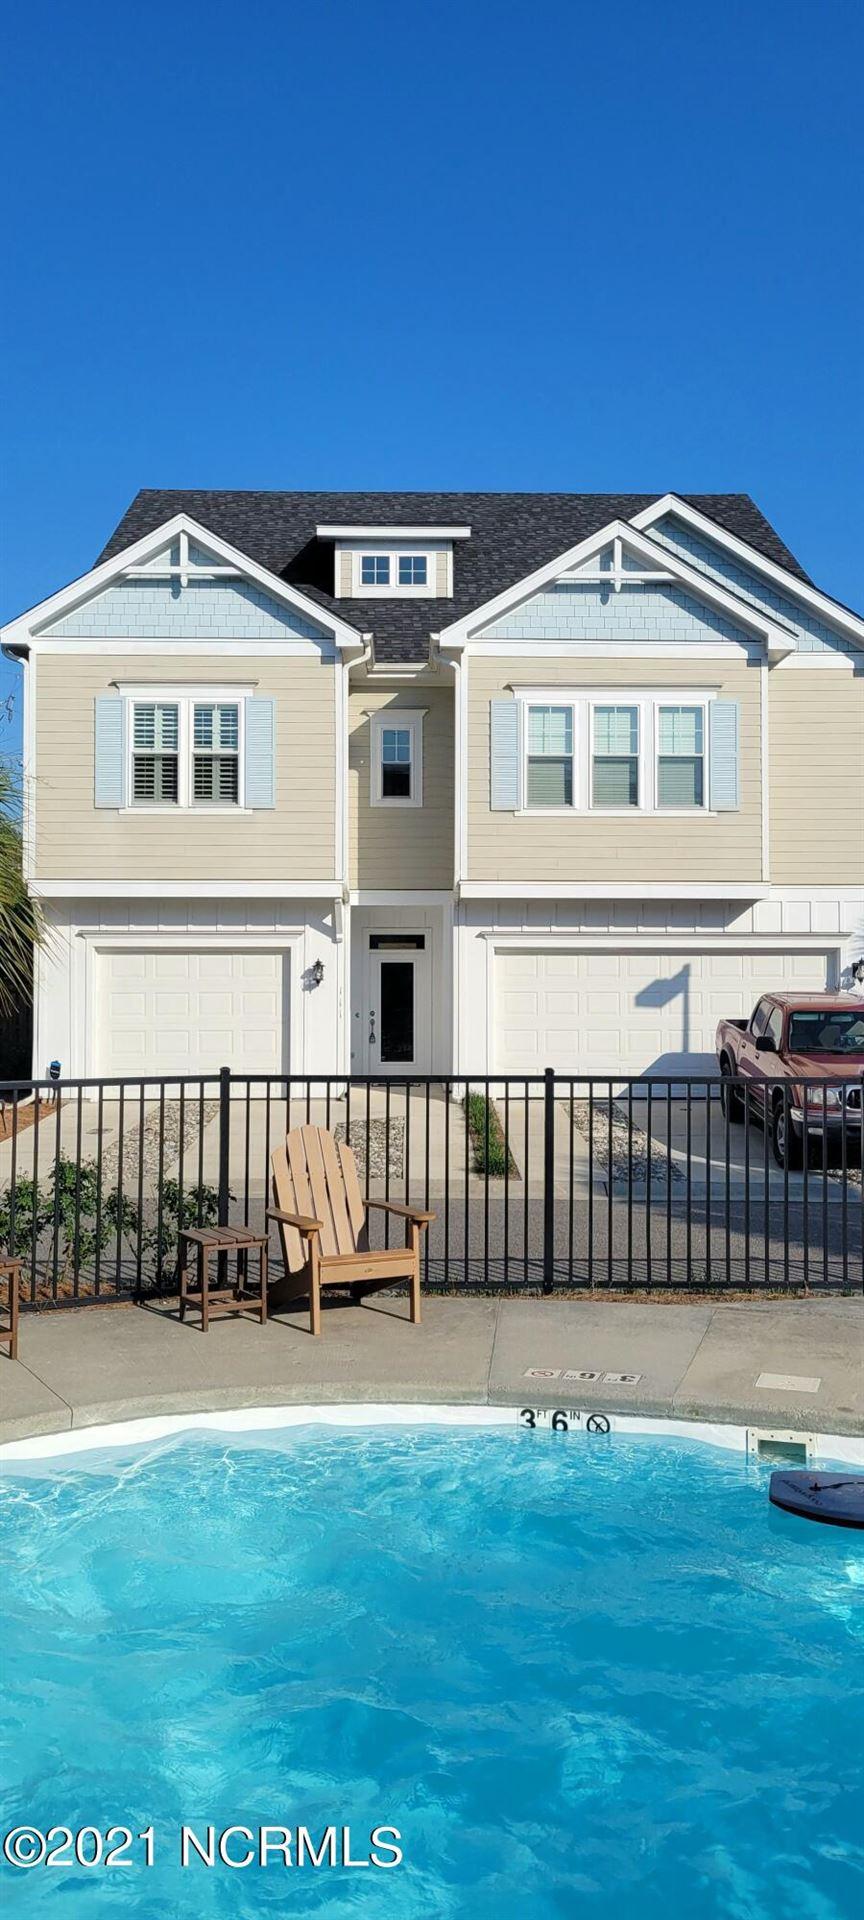 Photo for 111 Bimini Townes Lane, Carolina Beach, NC 28428 (MLS # 100279492)